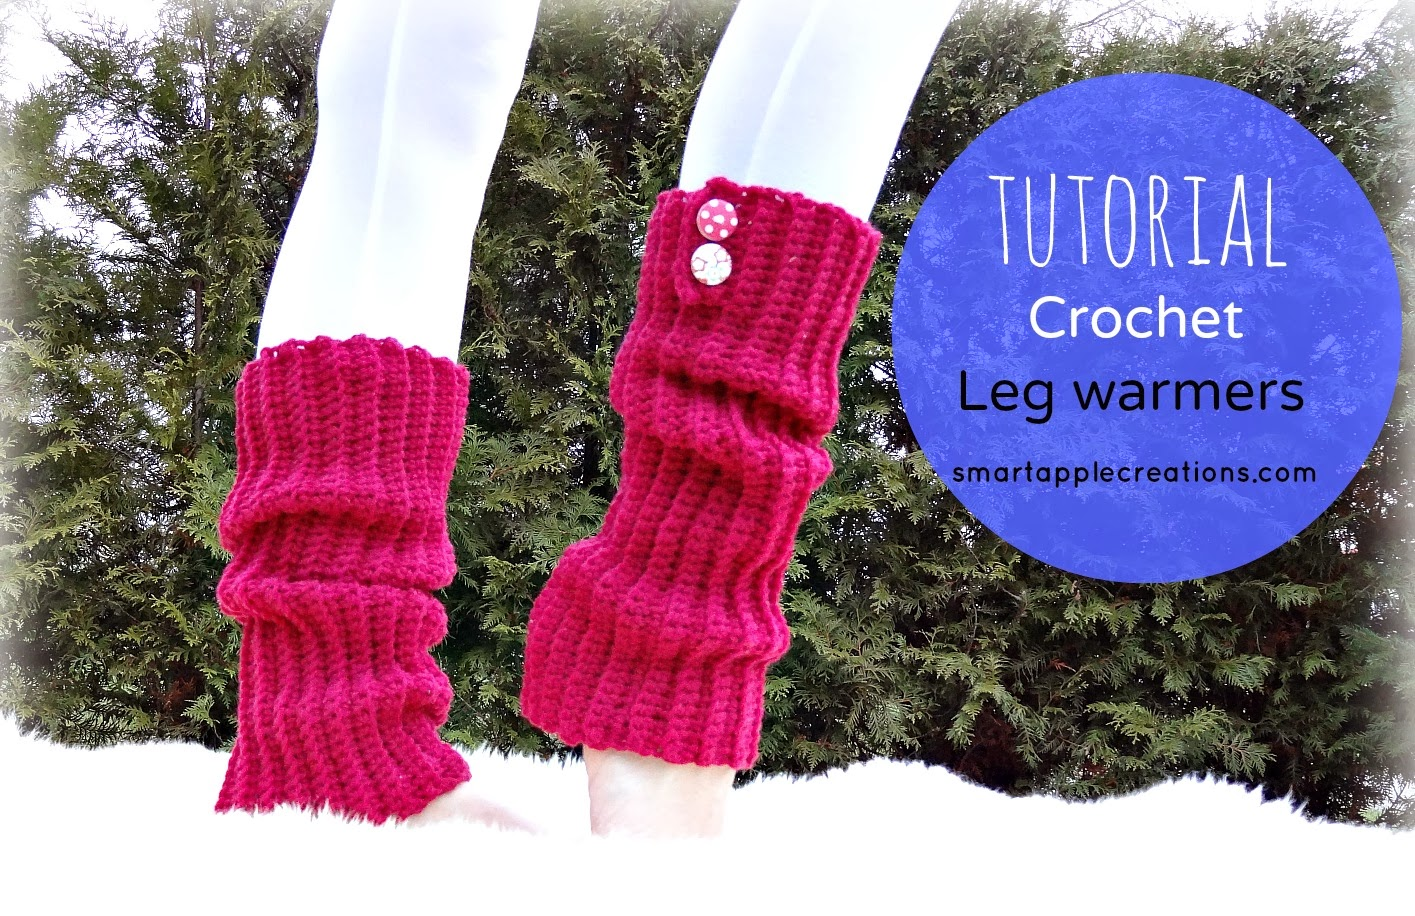 Amigurumi Crochet Animal Patterns Free : Smartapple Creations - amigurumi and crochet: Easy Ribbed ...